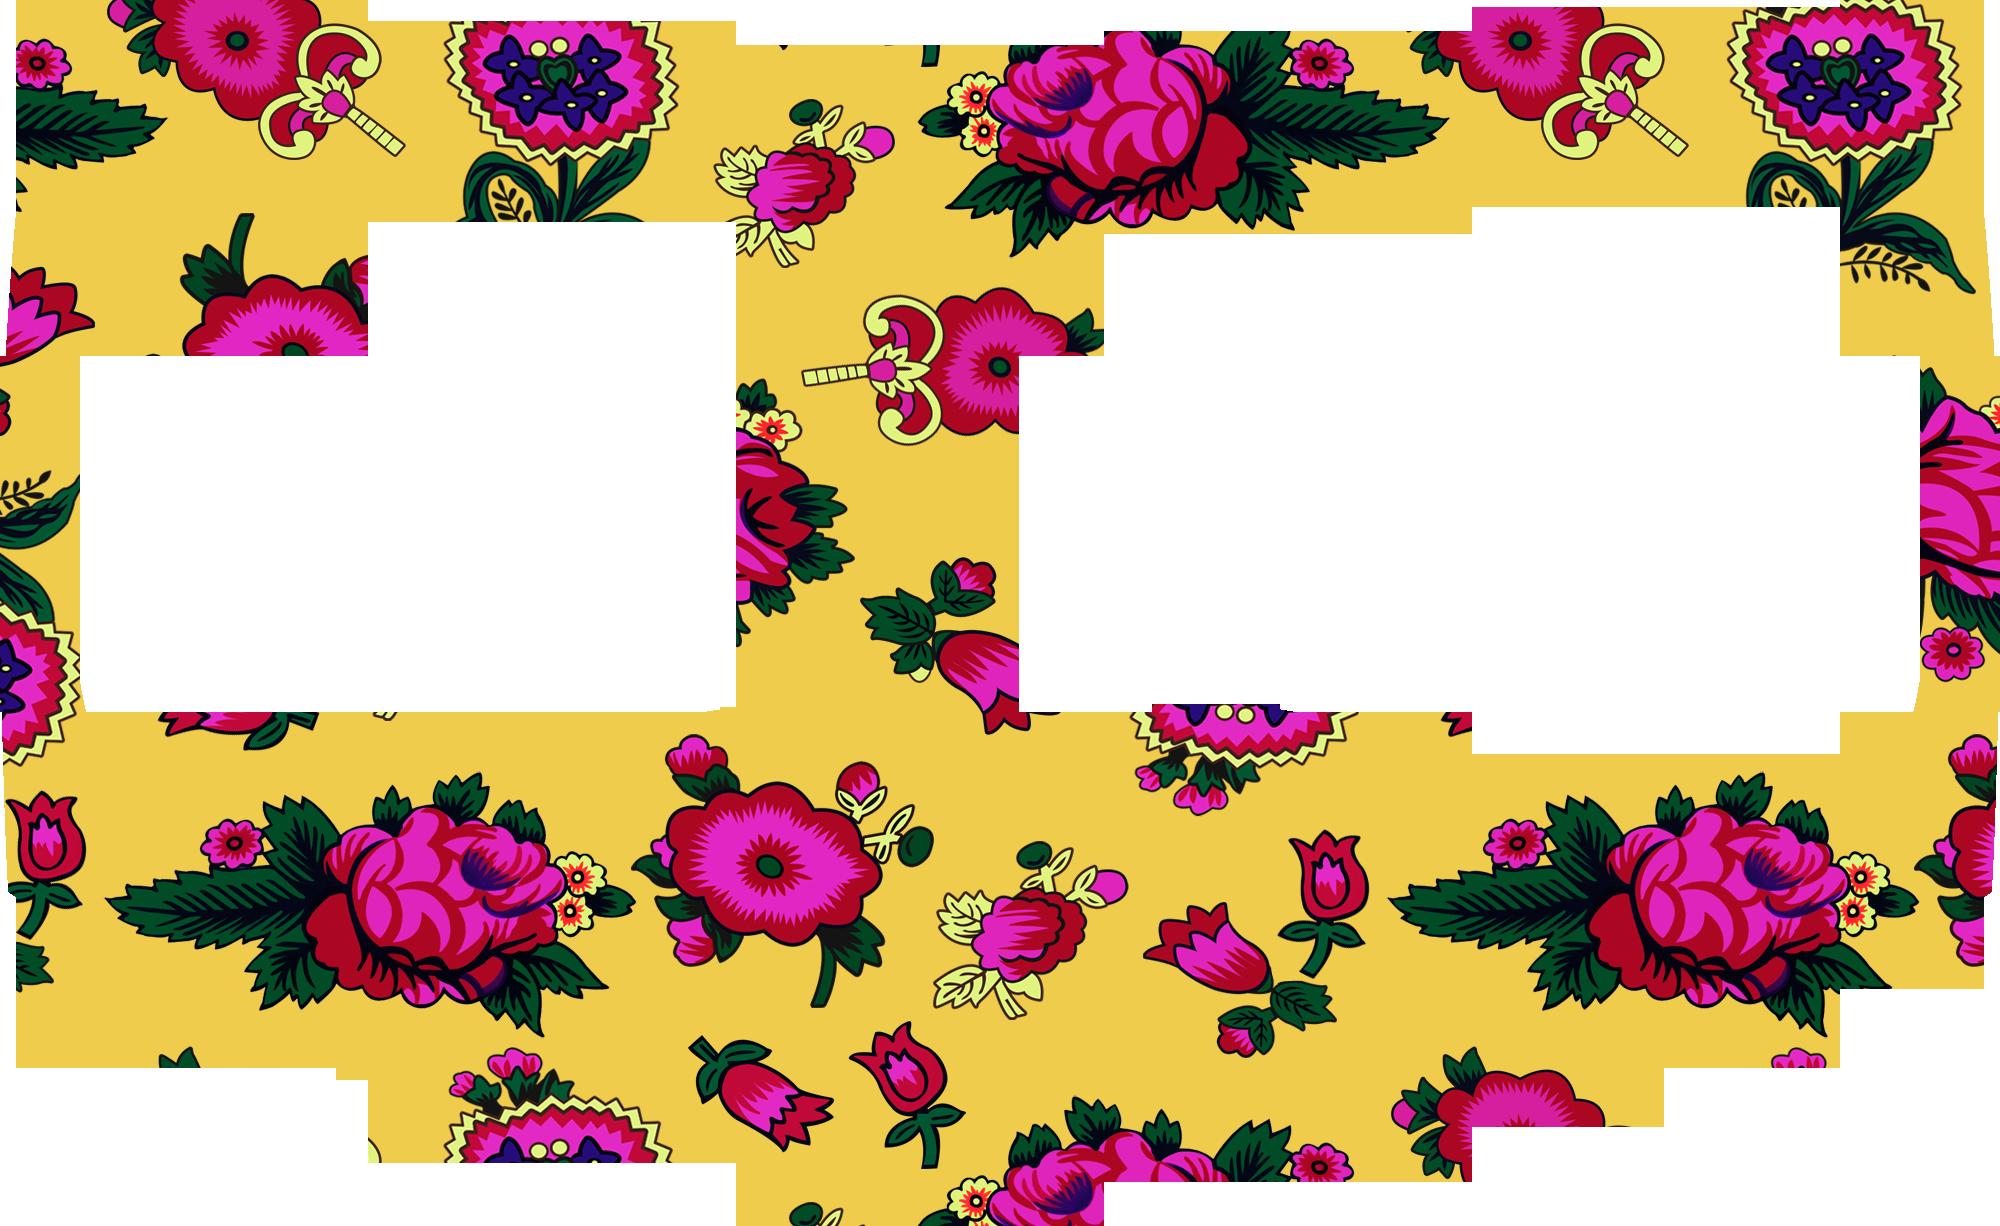 Pin By Afa On Decor Diys Ramadan Crafts Eid Crafts Eid Stickers